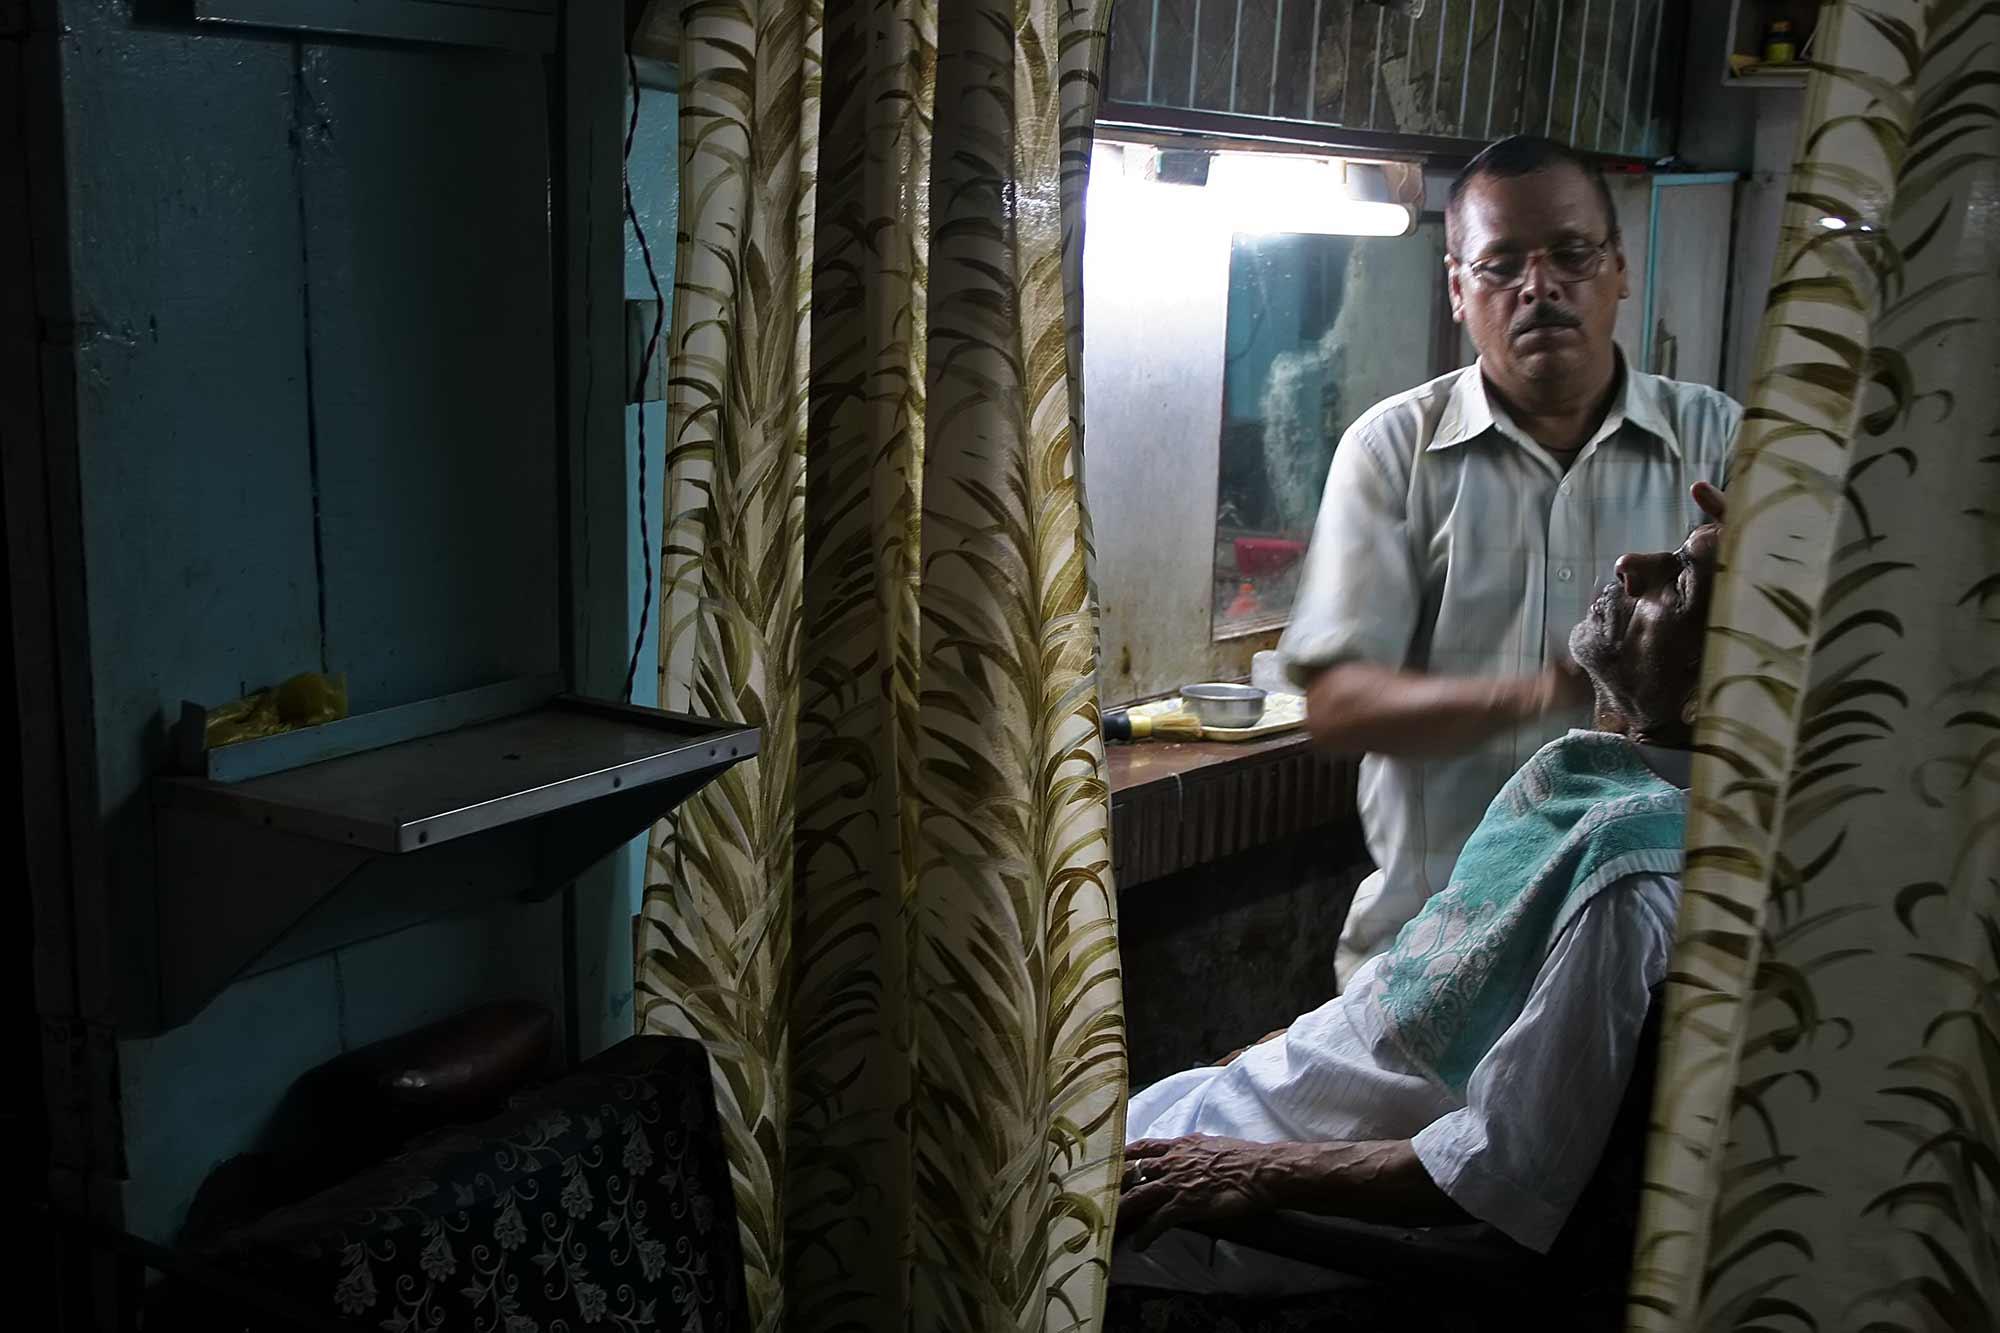 barber-shop-varanasi-india